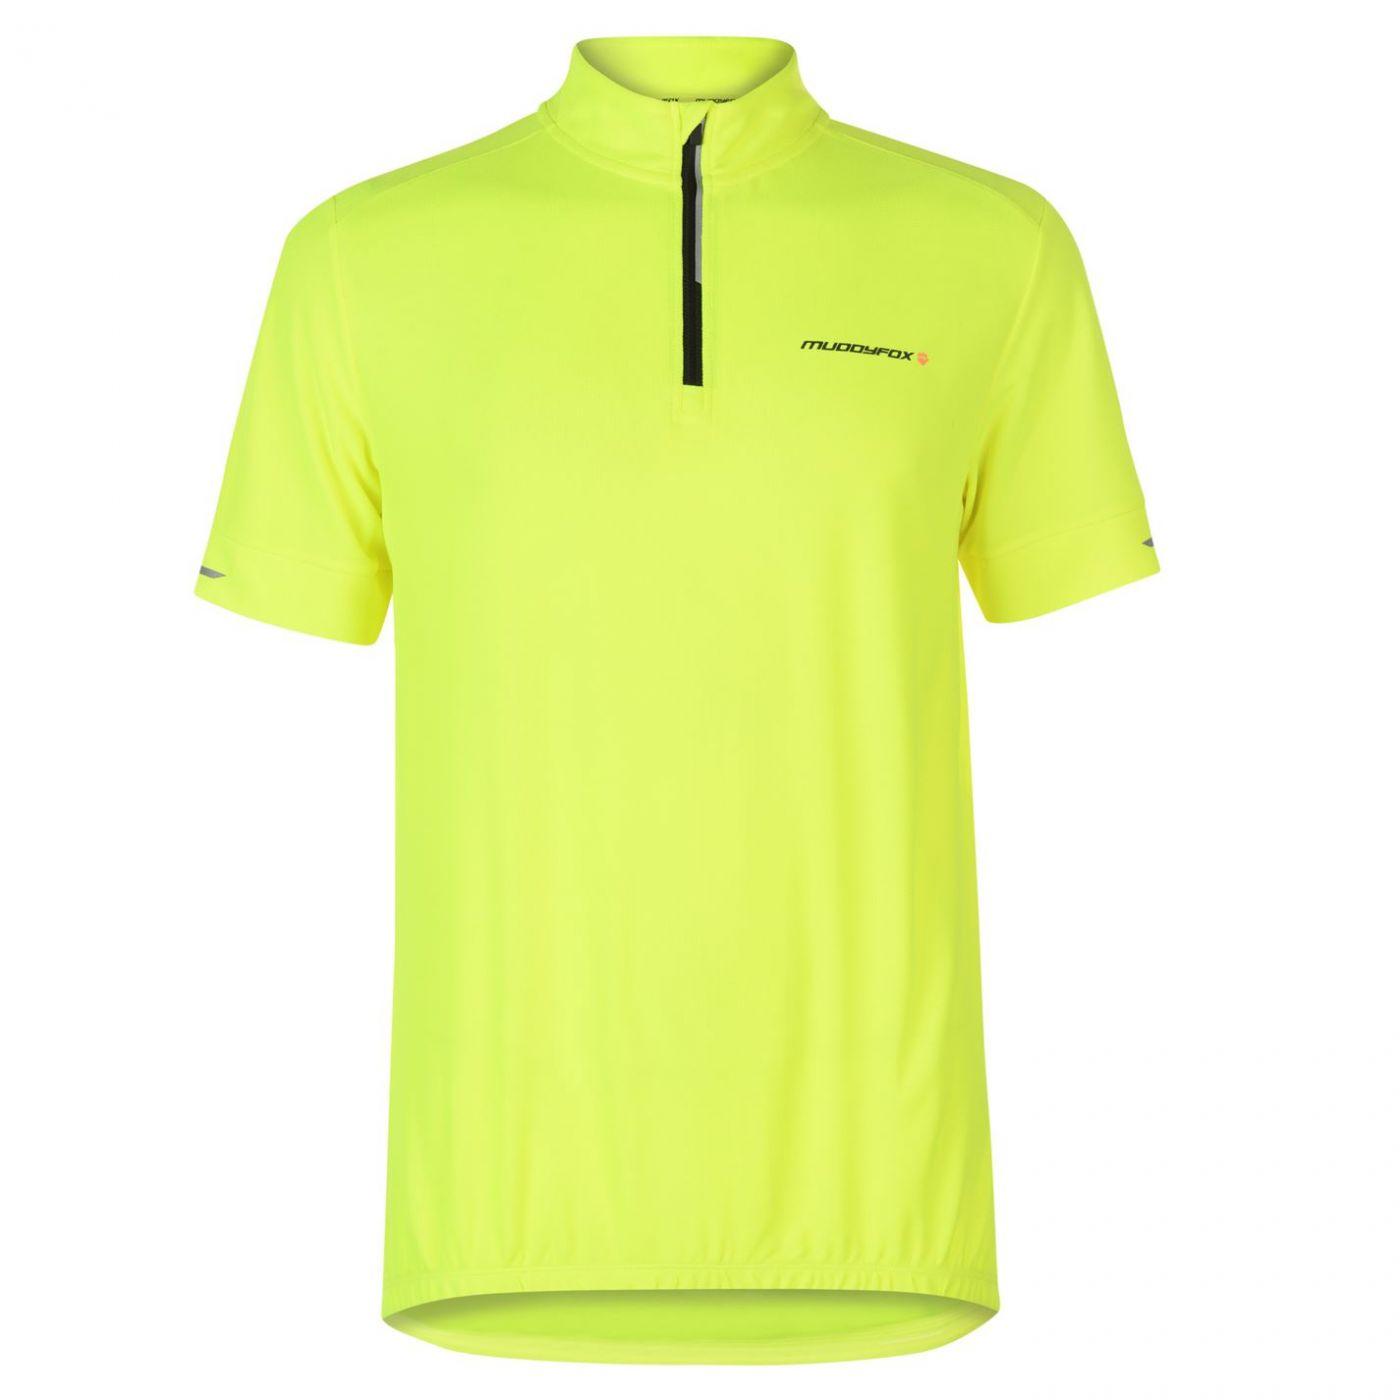 Muddyfox Cycling Short Sleeve Jersey Mens